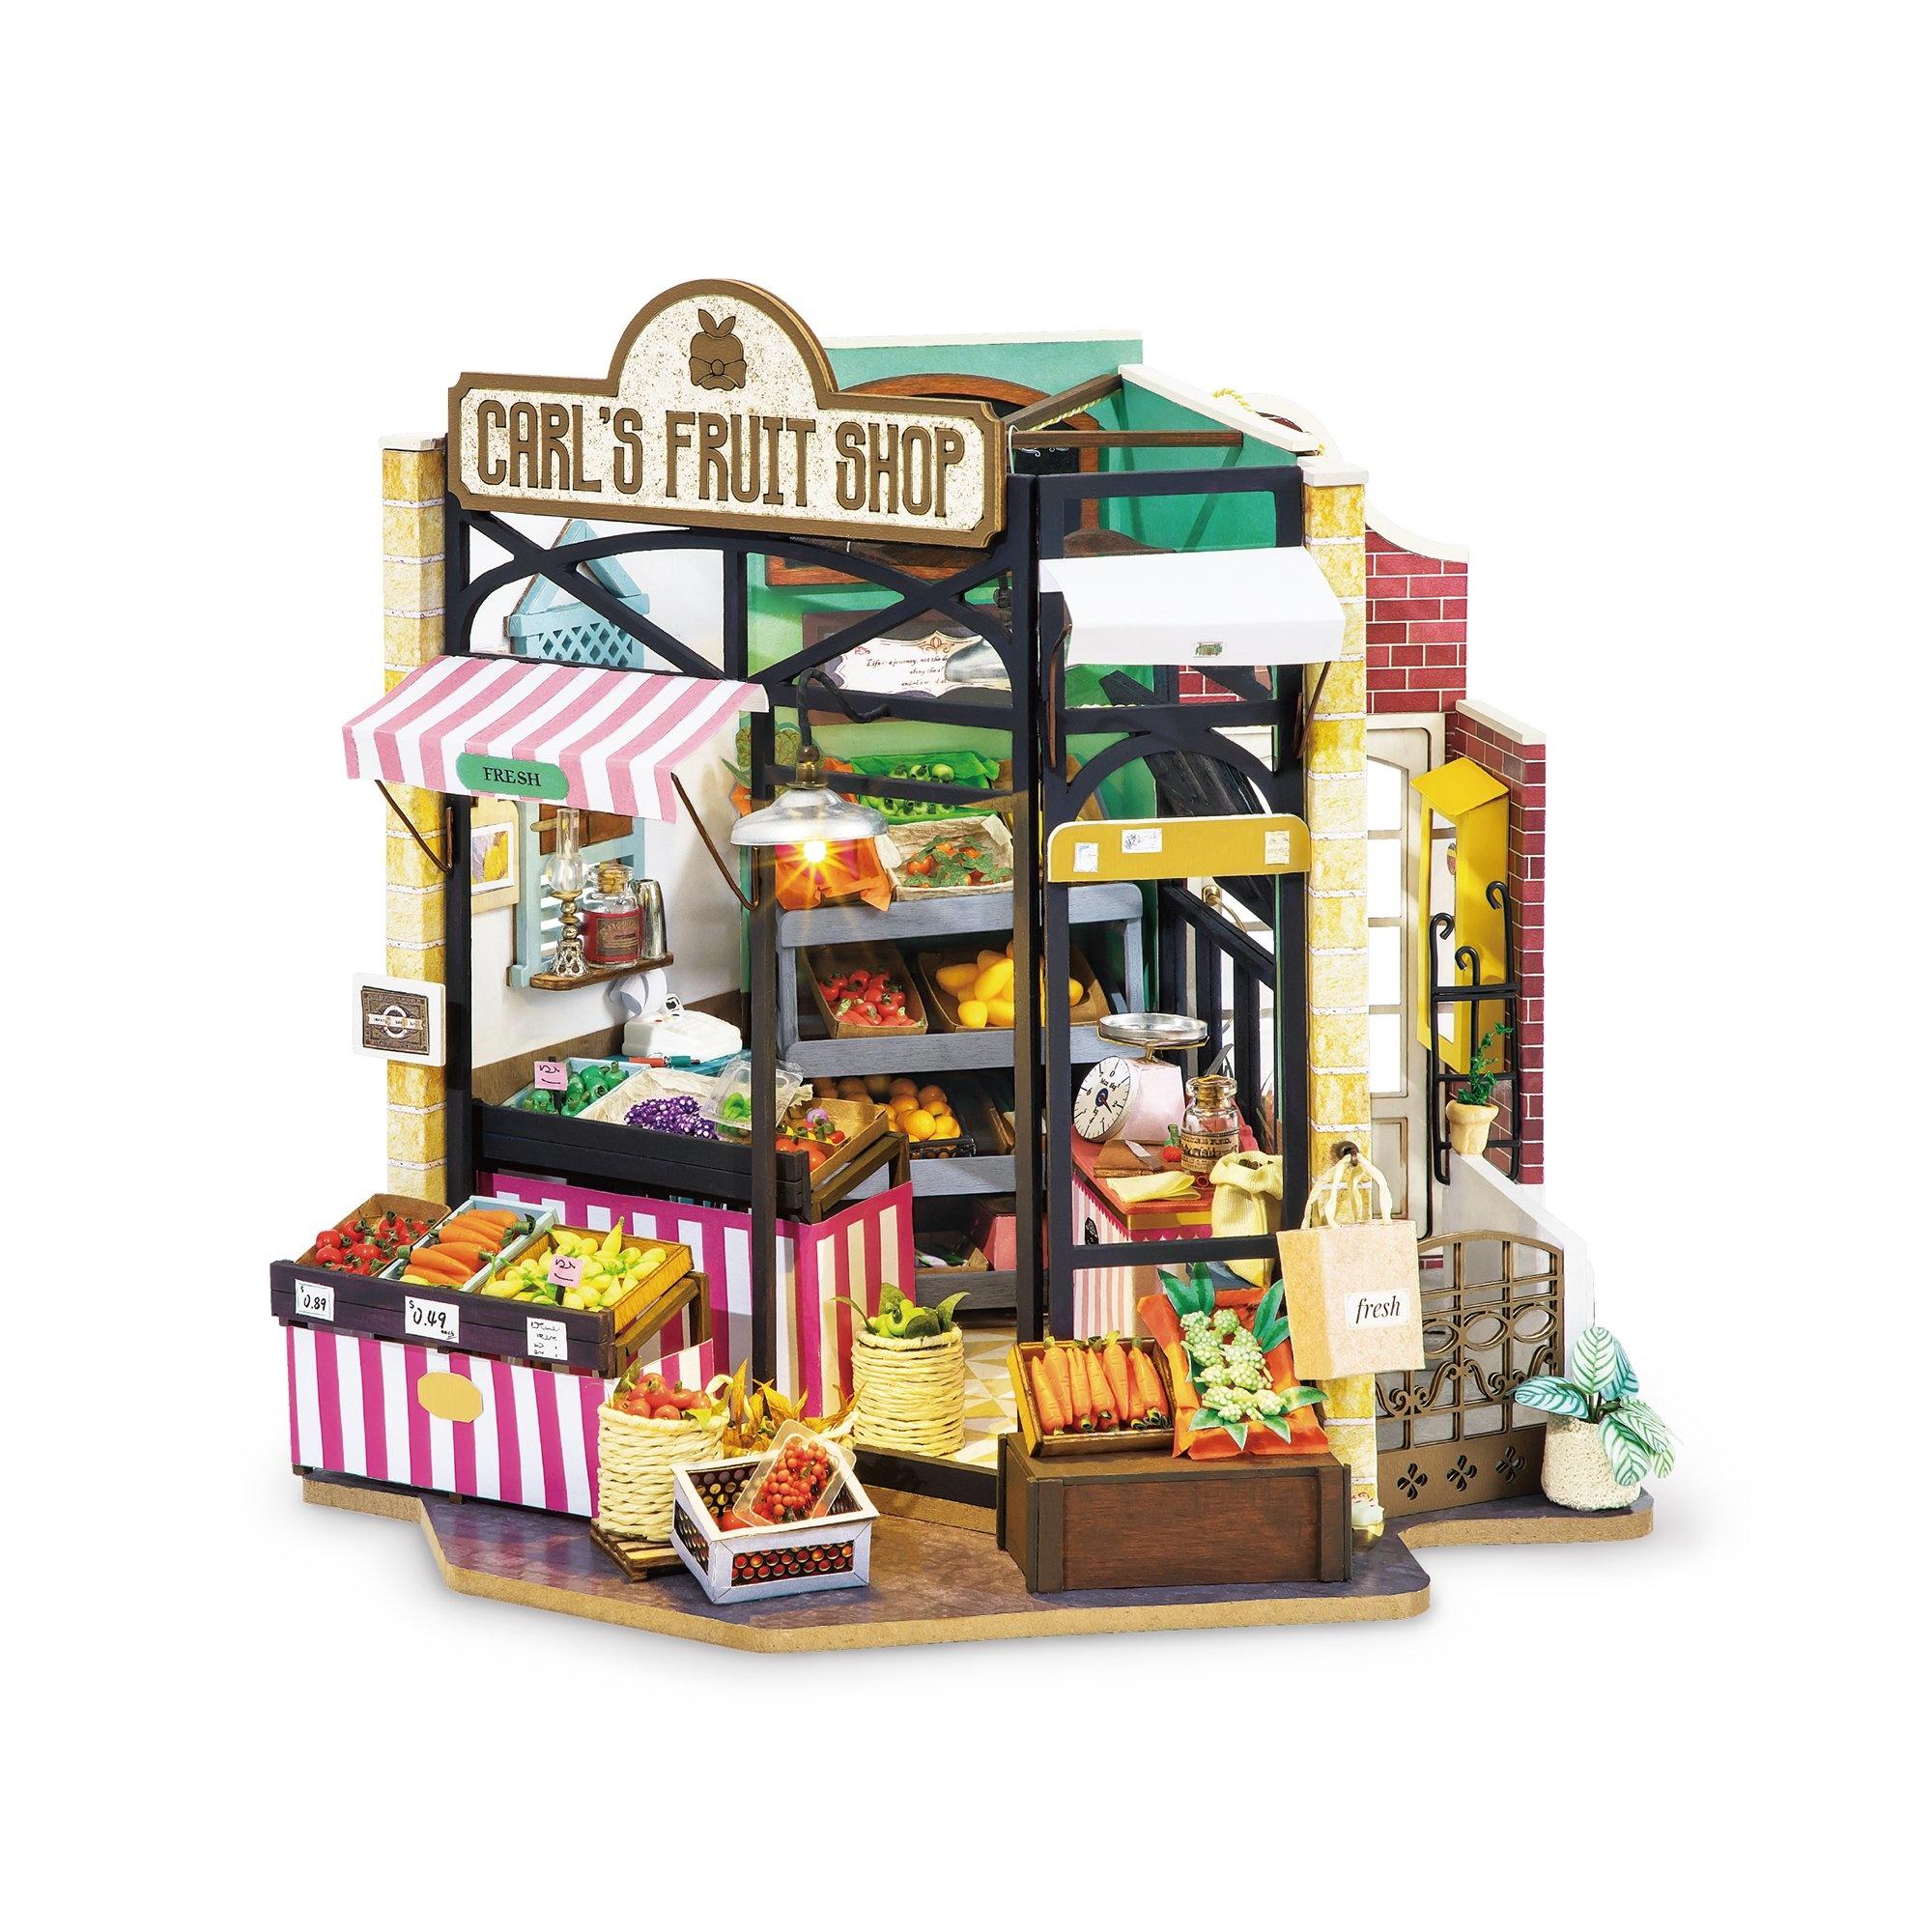 Hands Craft Fruit Shop DIY Miniature Dollhouse Kit